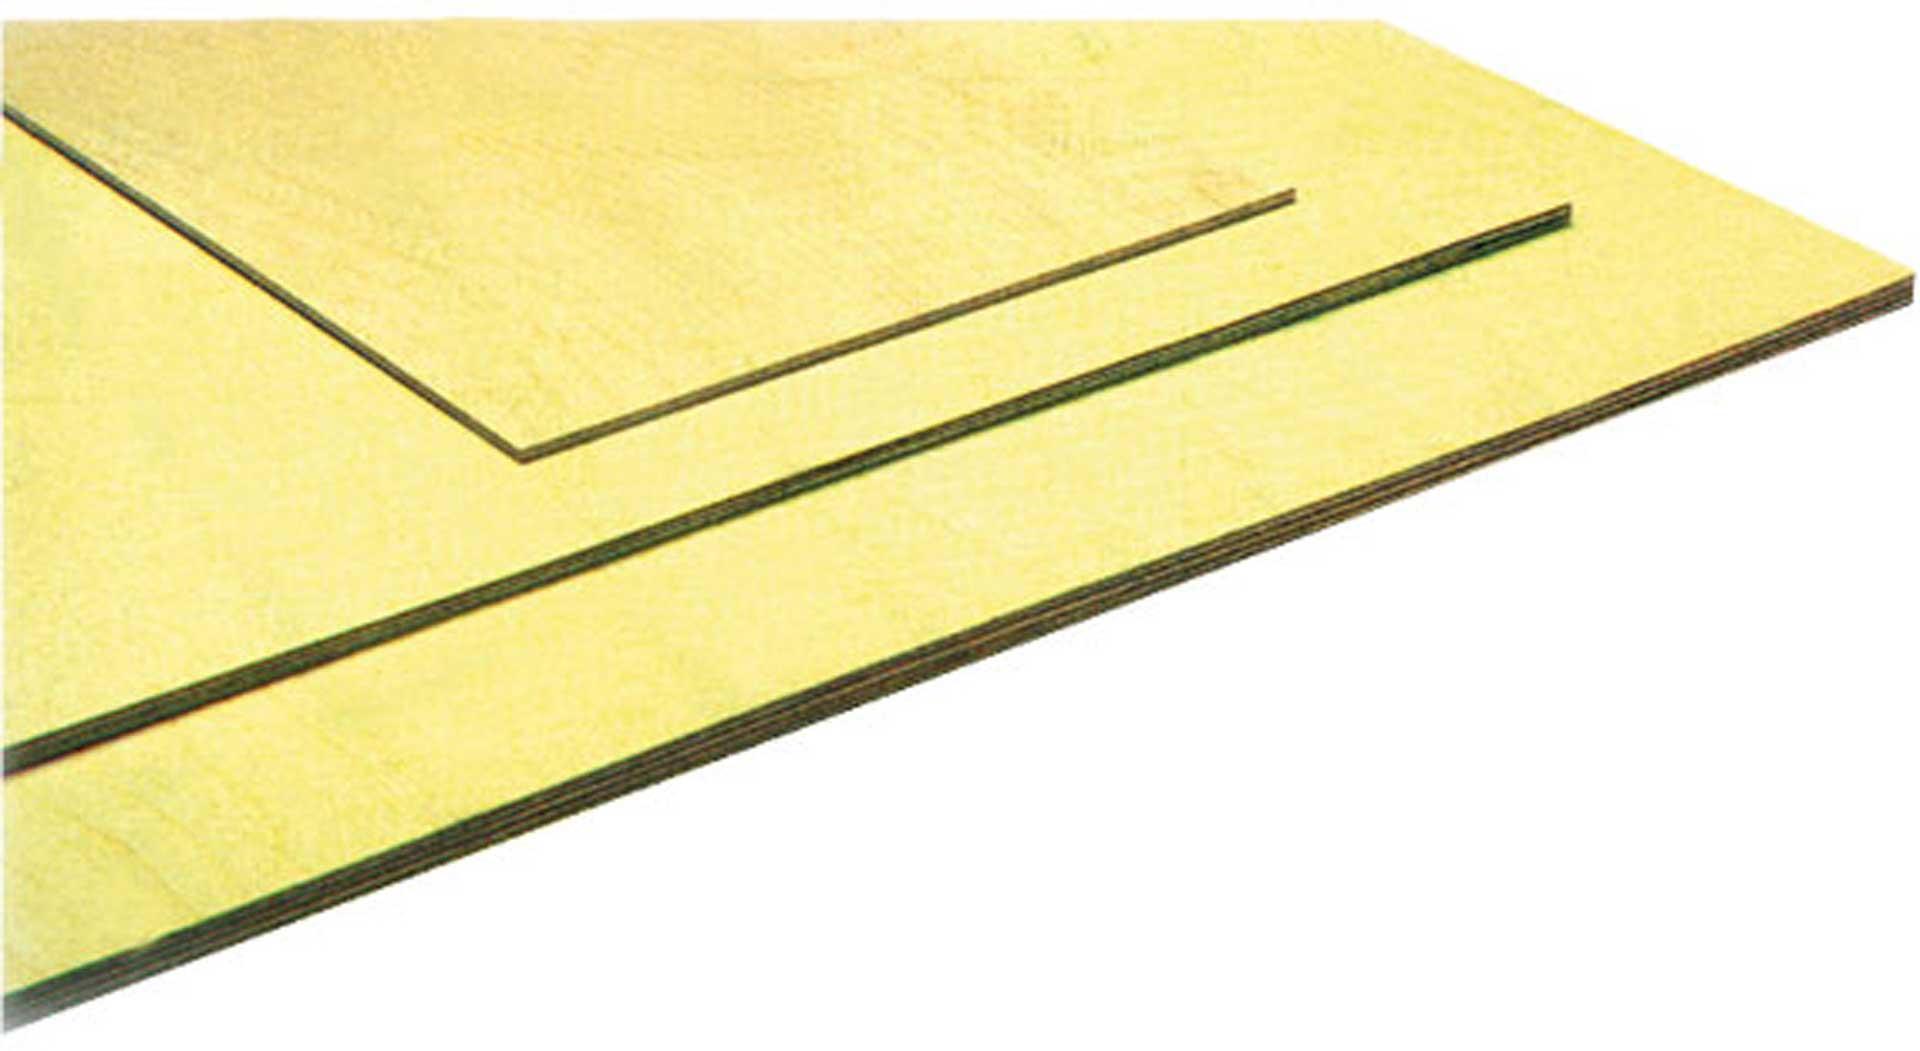 MODELLBAU LINDINGER BIRCH-SPERRY 2,5/300/500MM